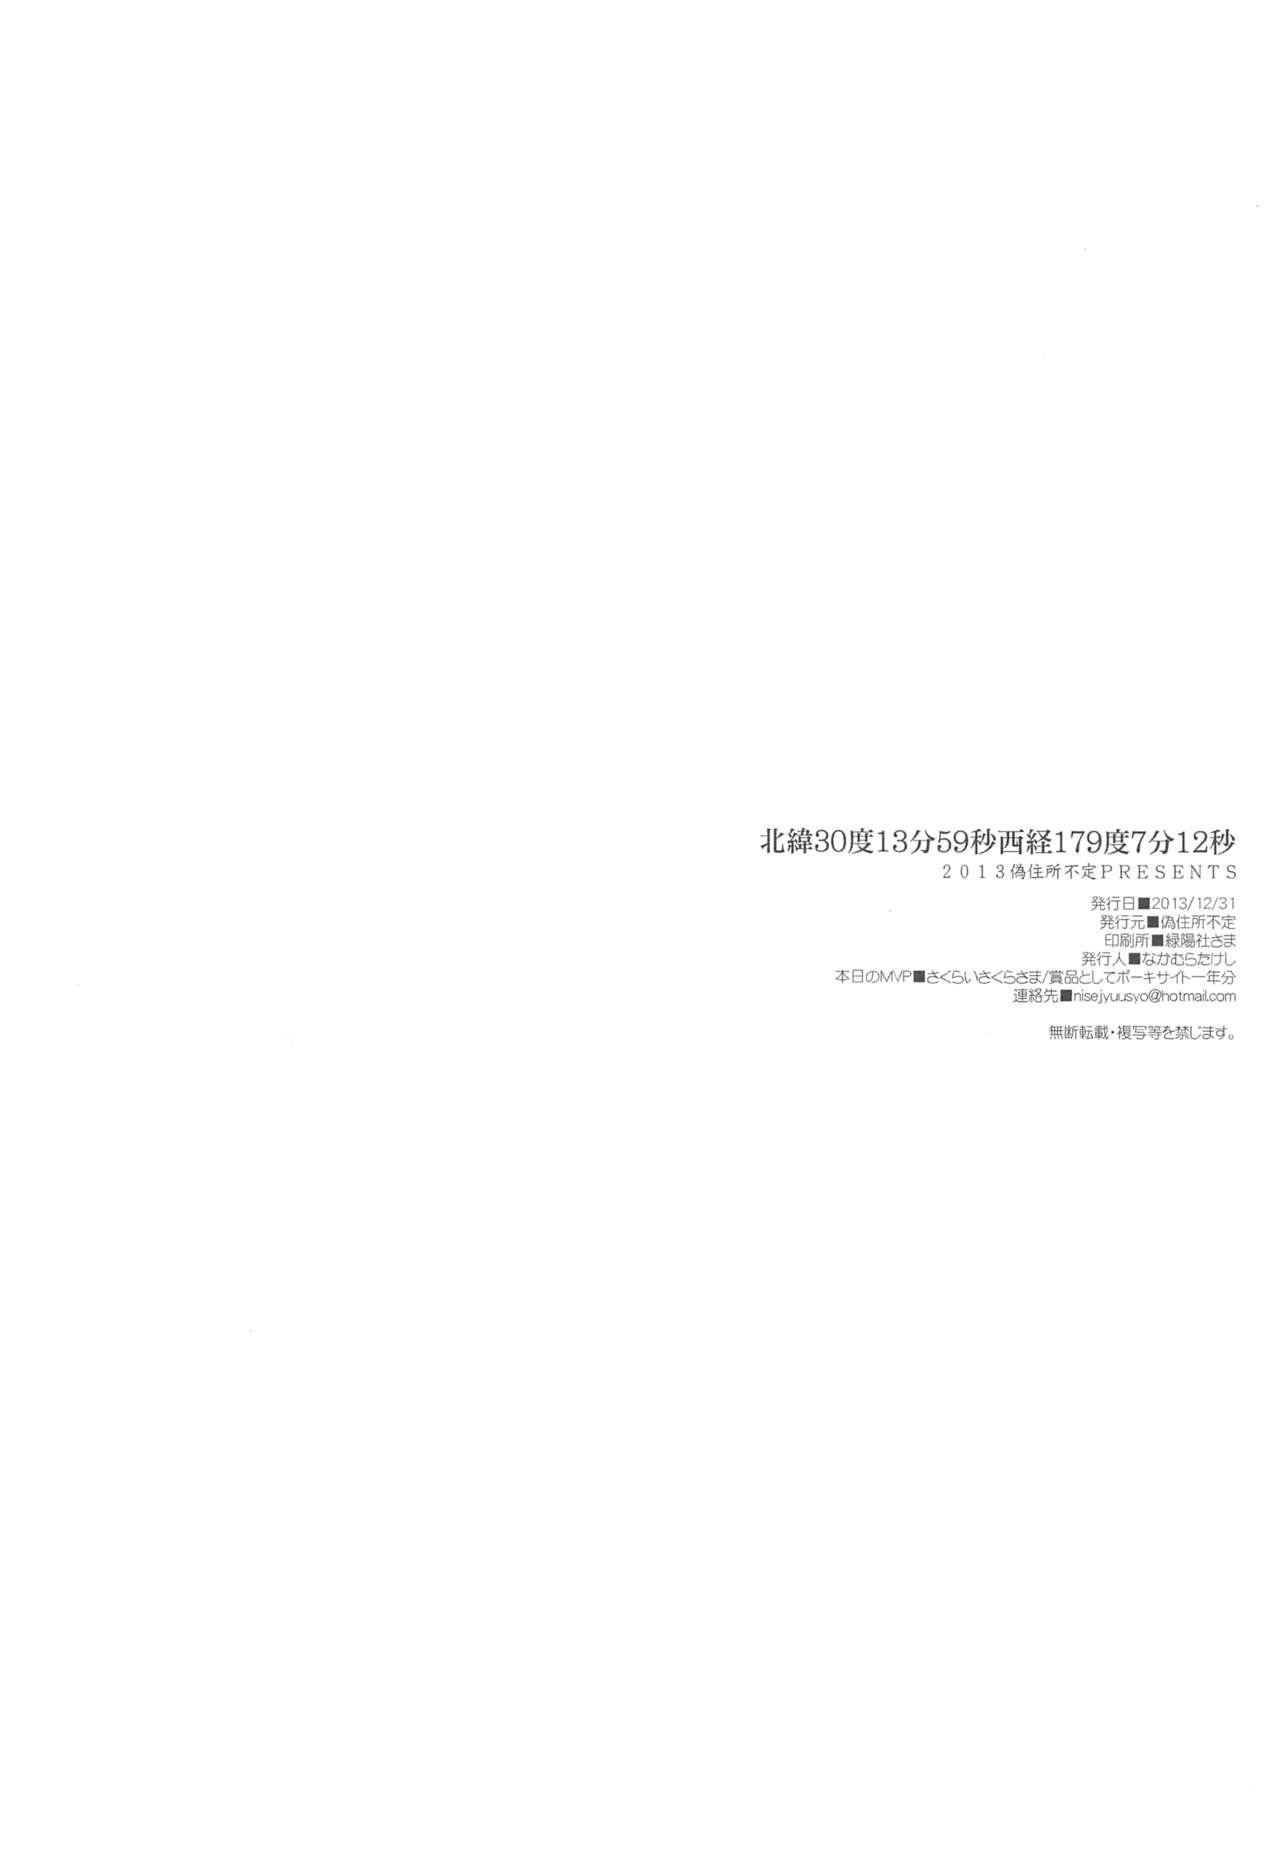 (C85) [Nise-Jyuusyofutei (Nakamura Takeshi)] Hokui 30-do 13-pun 59-byou Seikei 179-do 7-fun 12-byou (Kantai Collection -KanColle-) 29